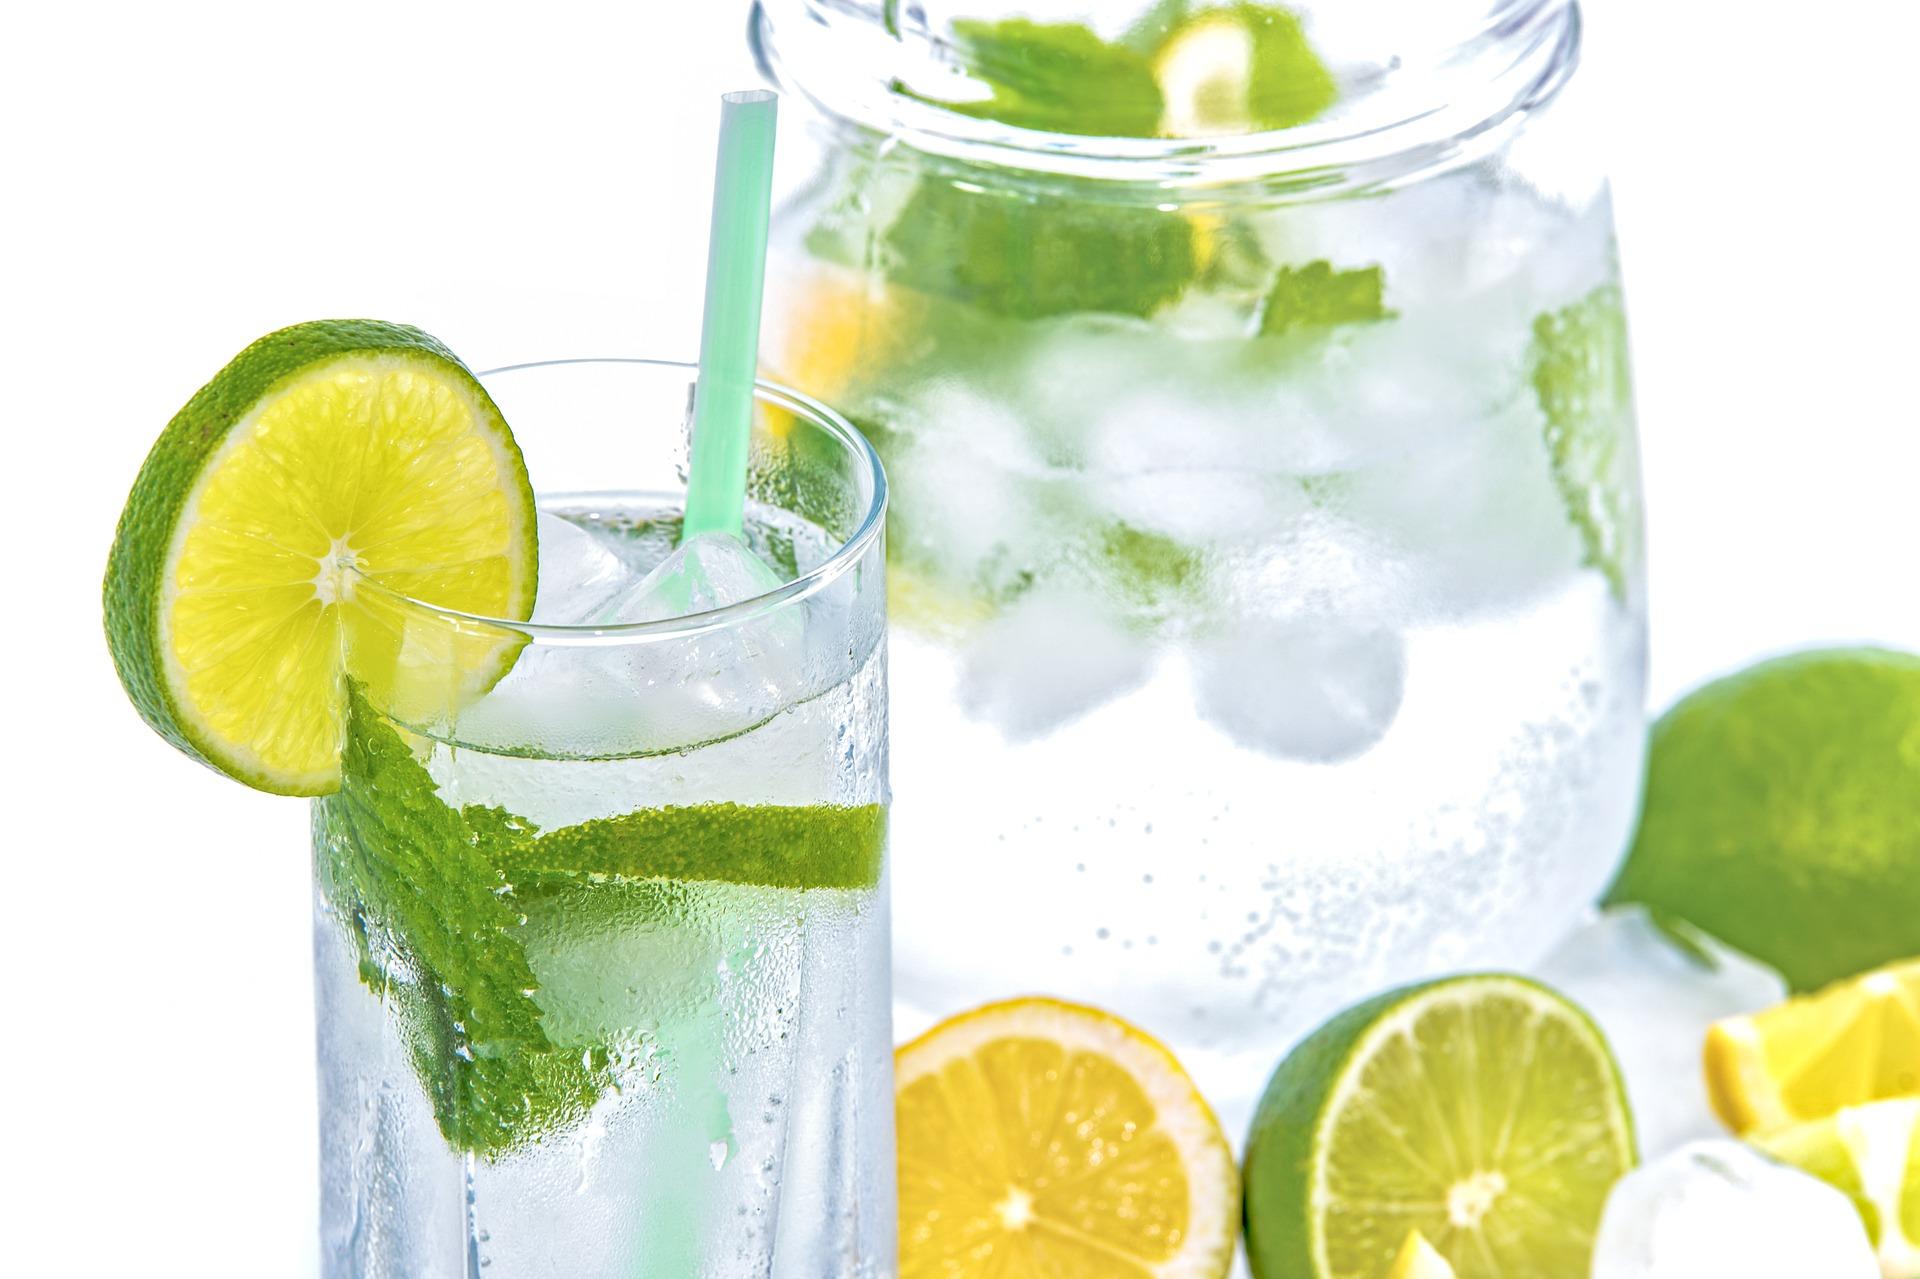 glass of lemon water.